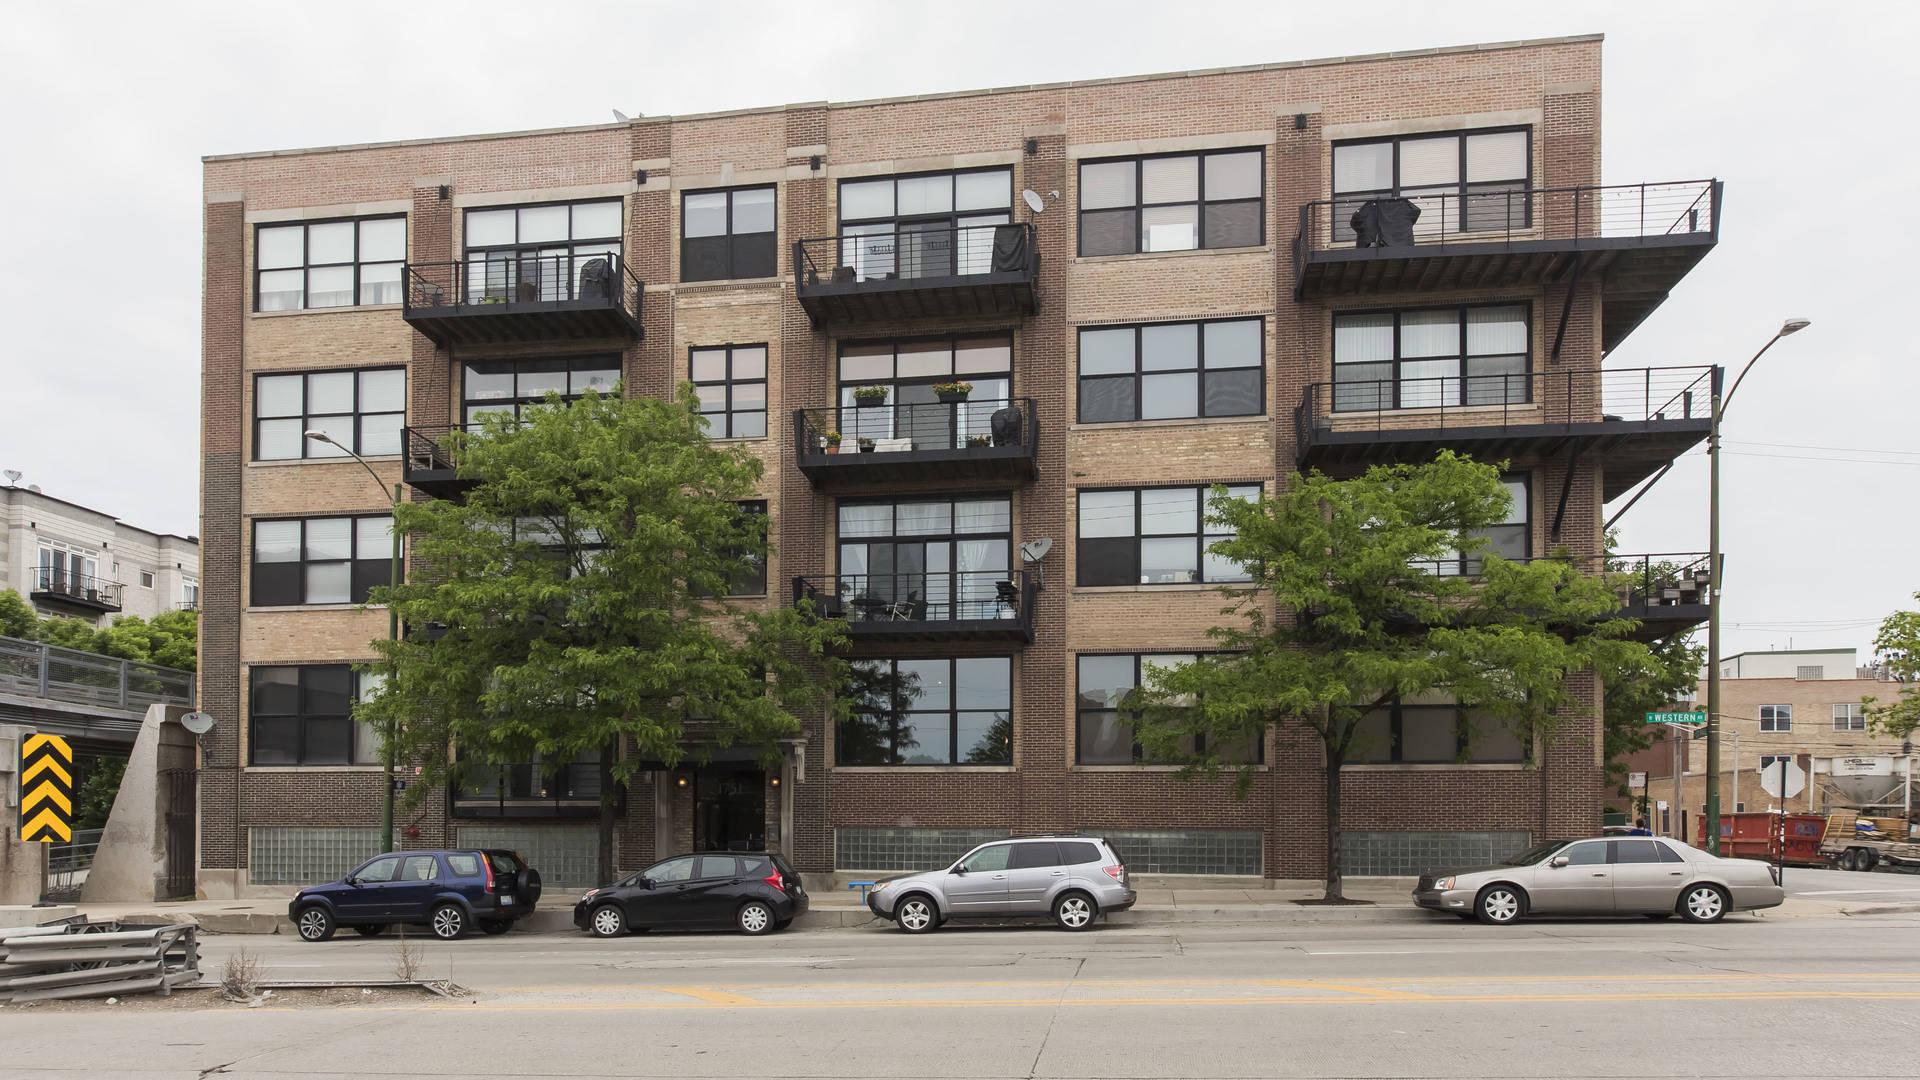 1751 N Western Ave Unit 406 Chicago, IL 60647